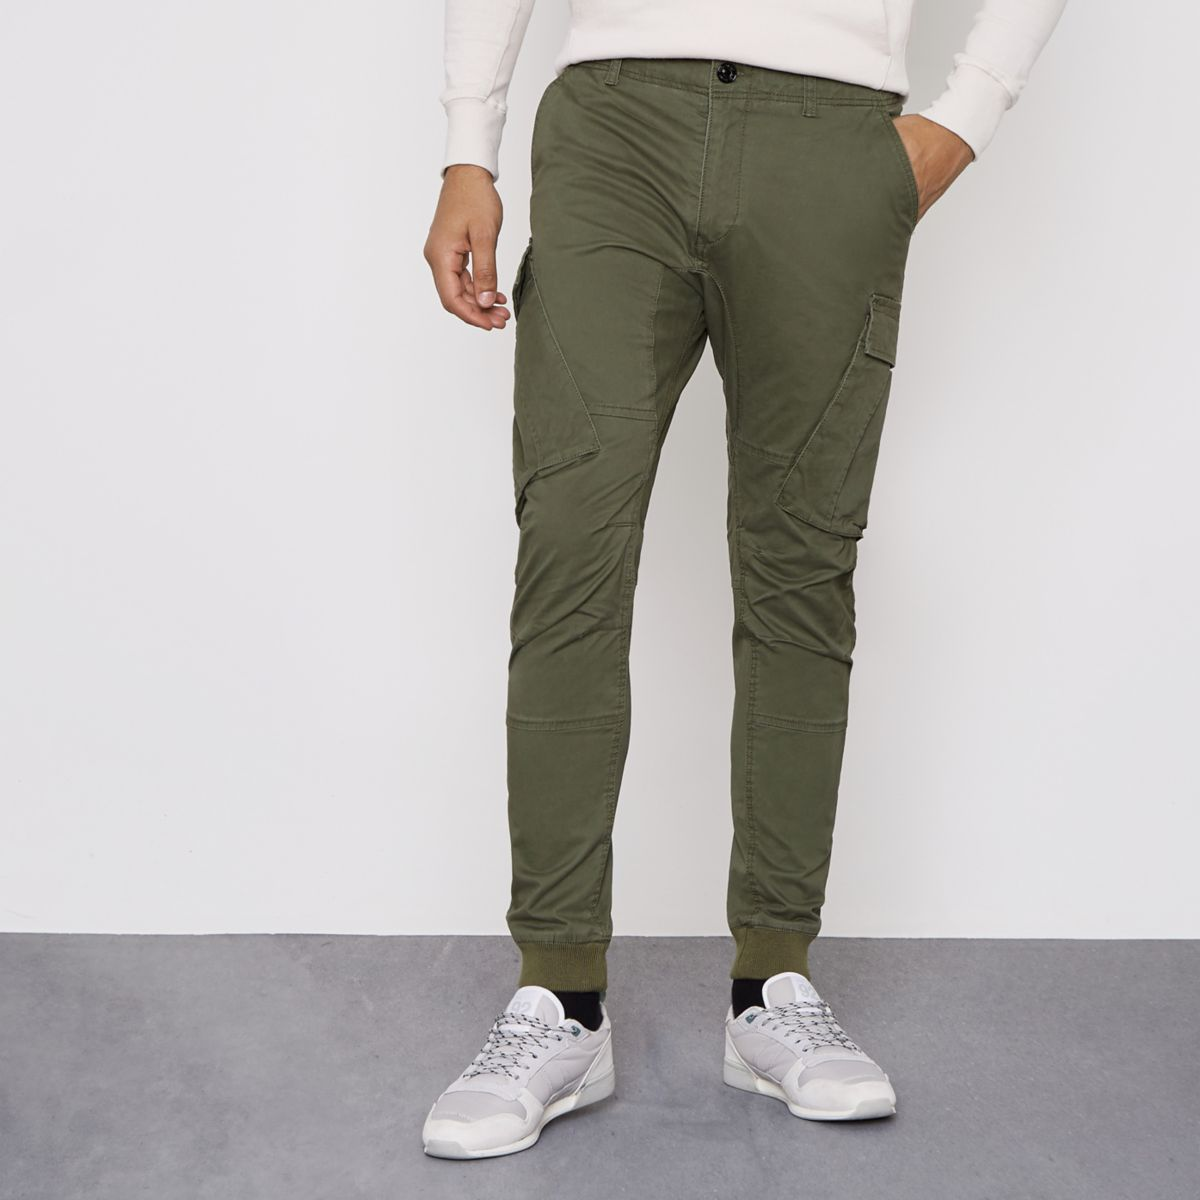 Khaki green cargo pants